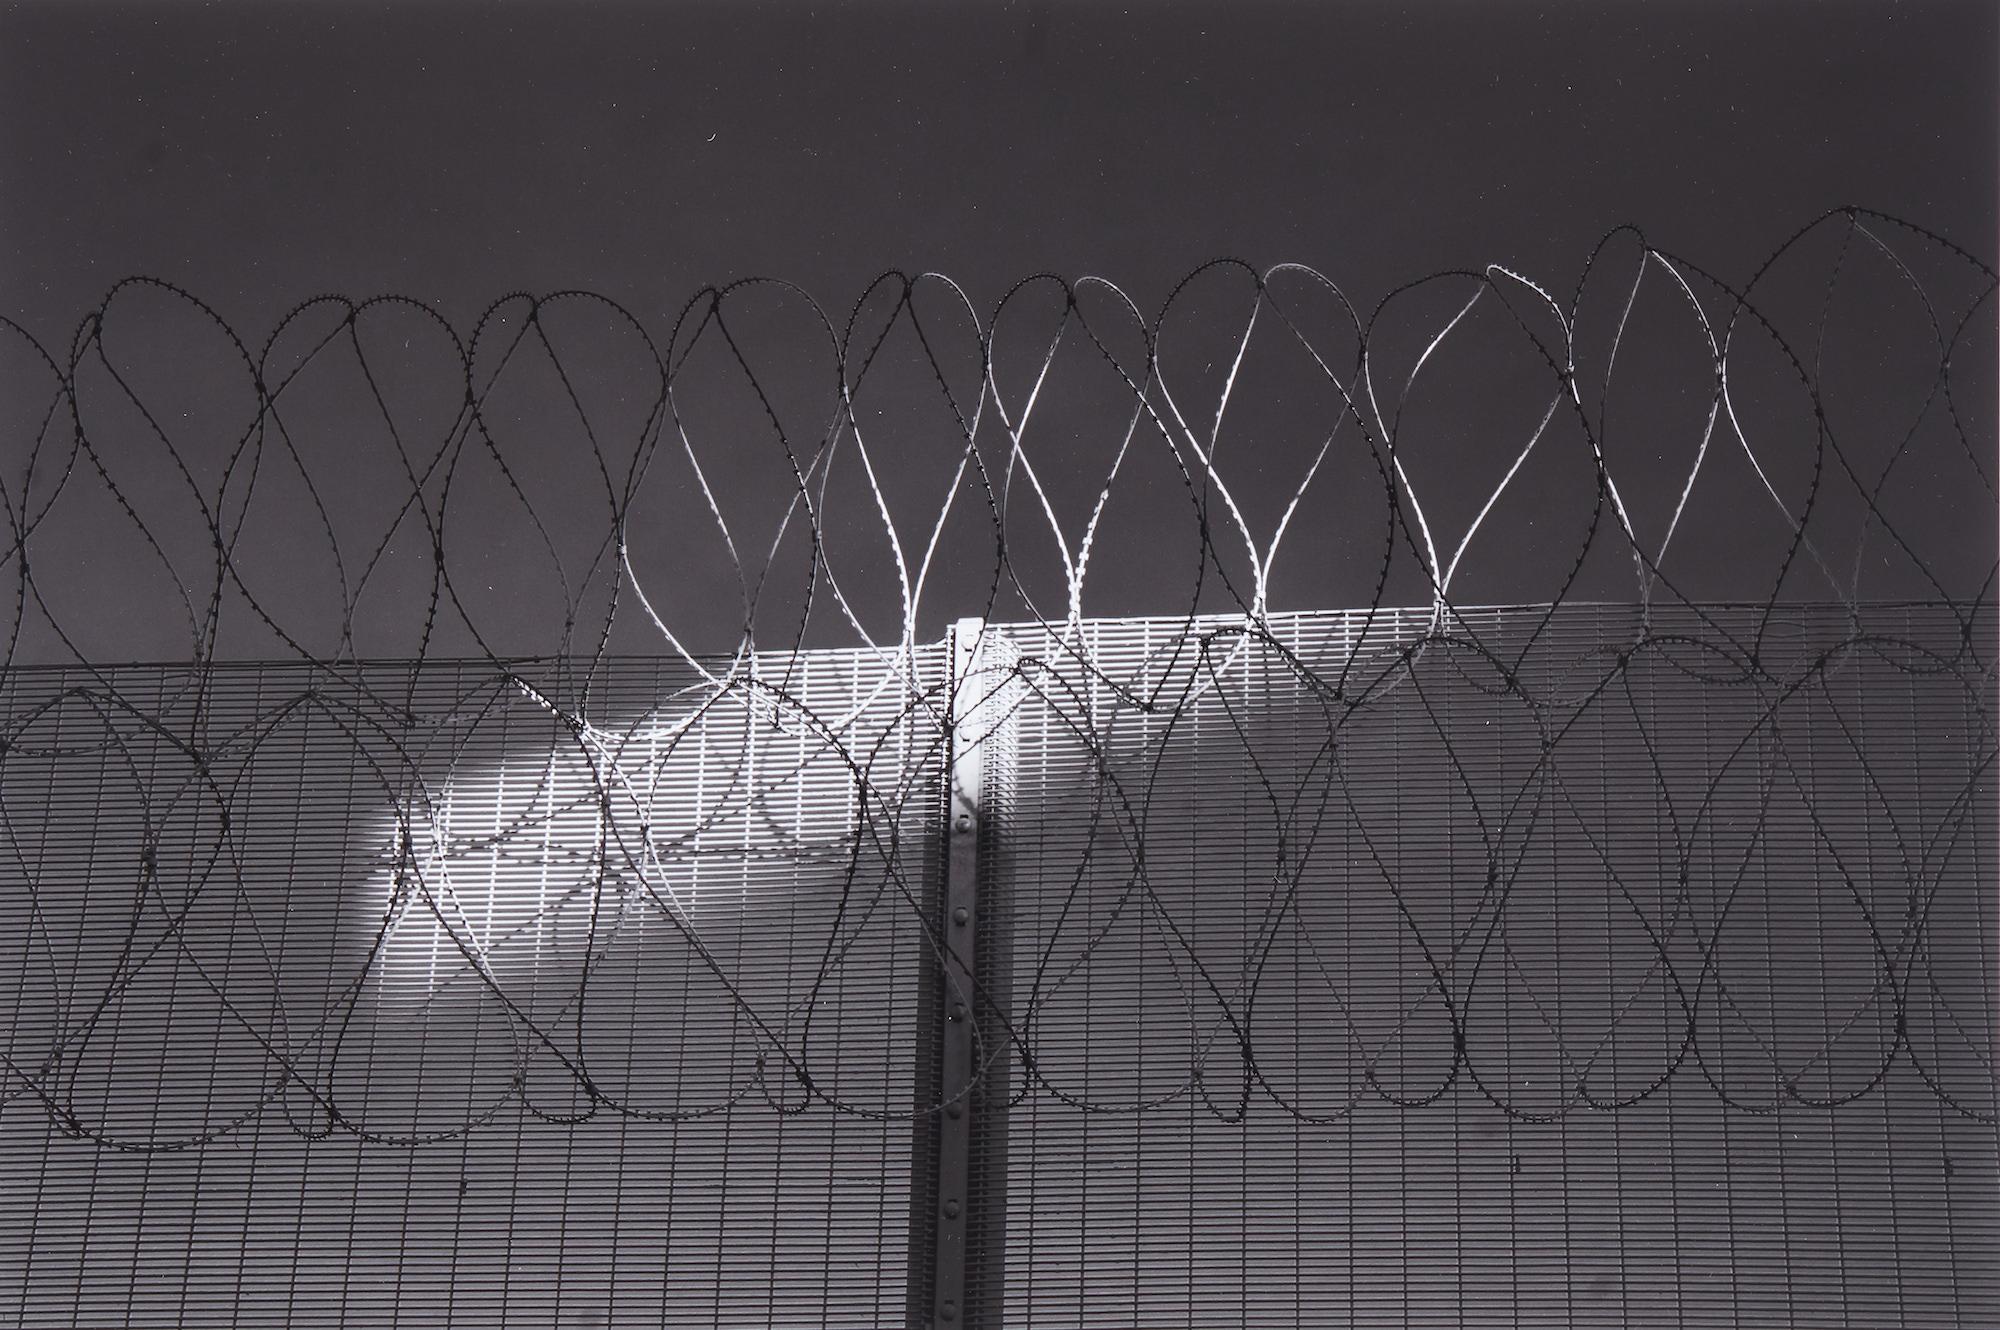 Photograph 8, Guernsey Prison, Keith Bromley Bronze Award for Photography